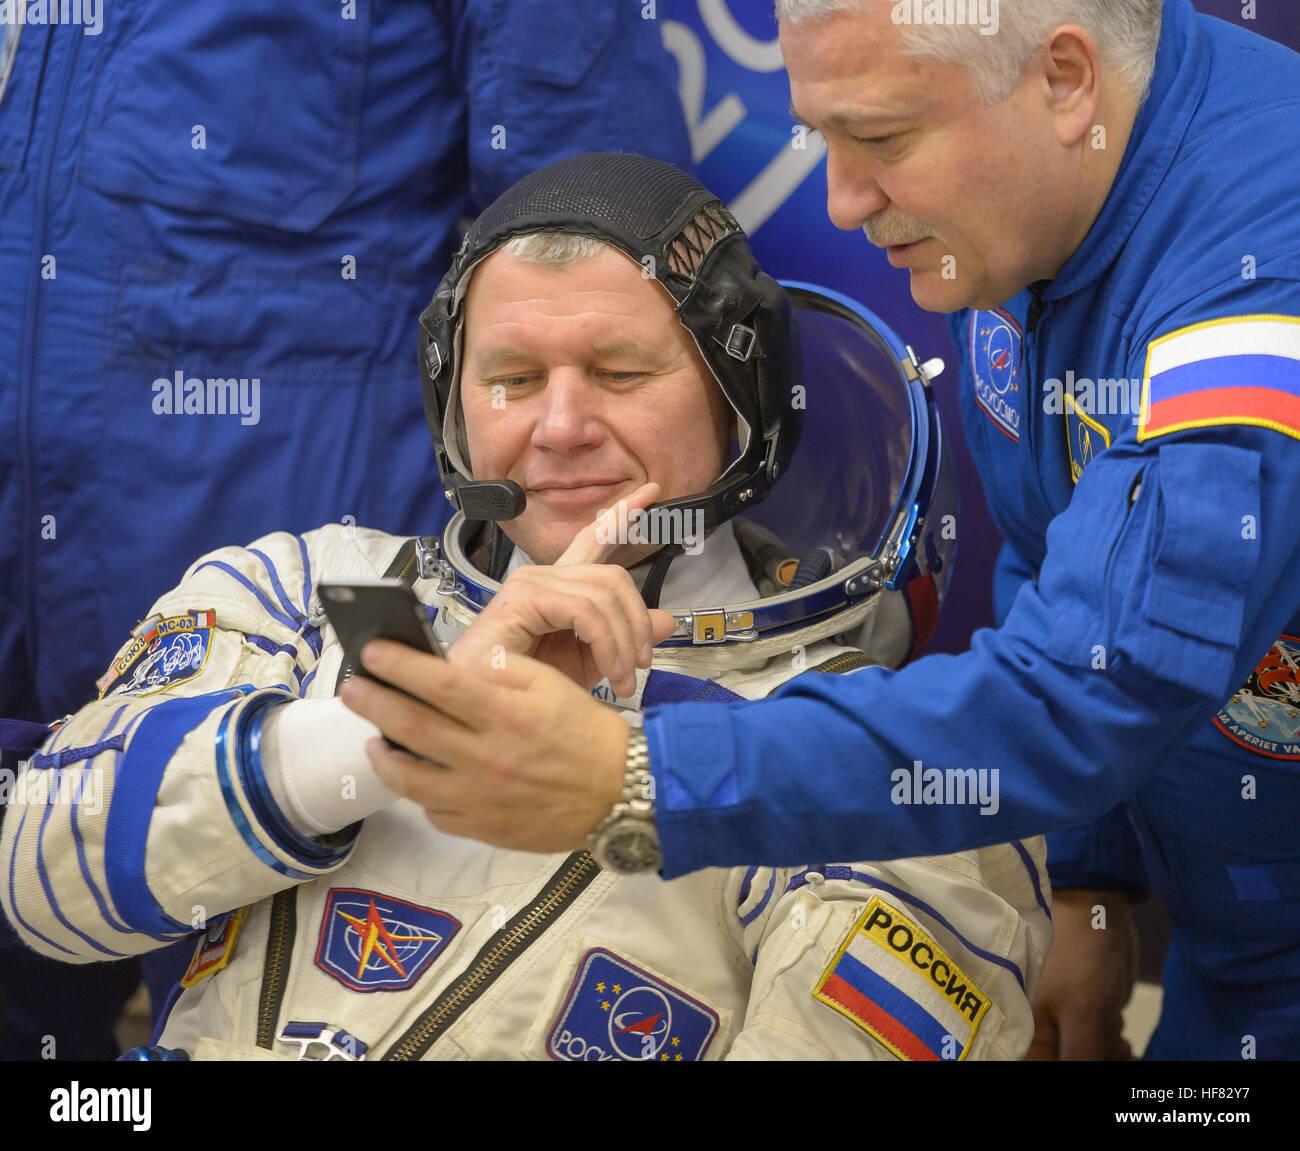 Expedition 50 Russian cosmonaut Oleg Novitskiy of Roscosmos, left, views a photo on backup crew member Russian cosmonaut - Stock Image